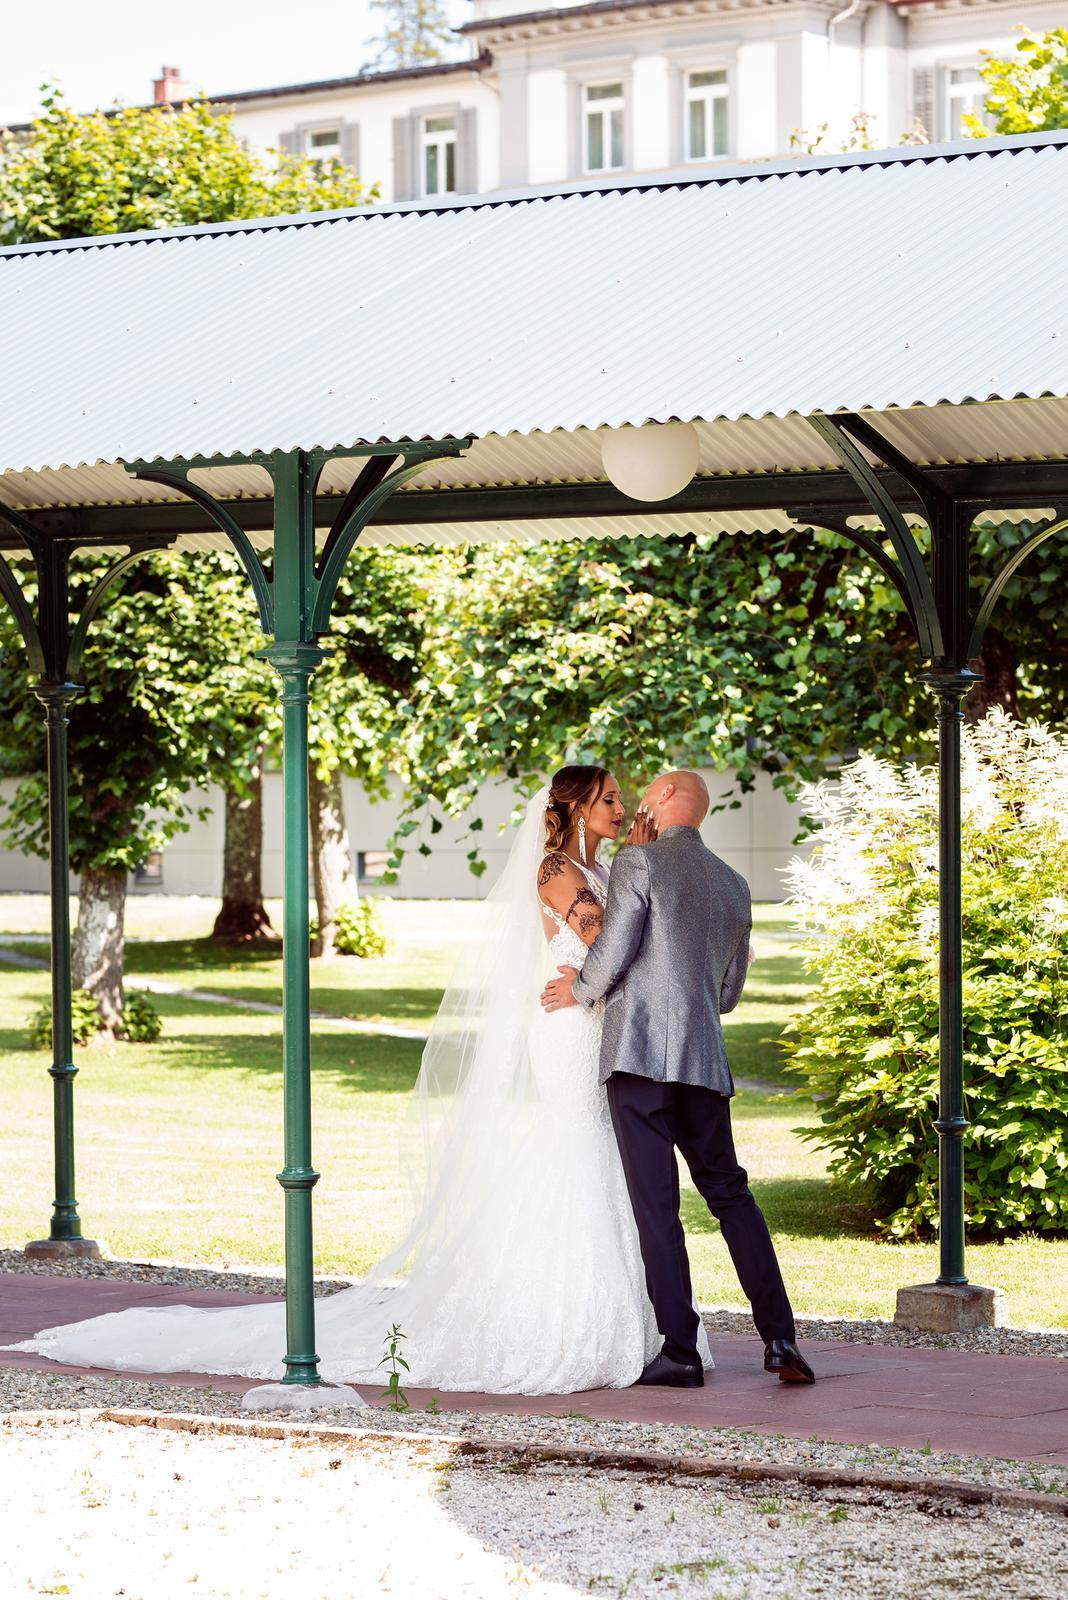 Svadba Zahra a Milan - Obrázok č. 14